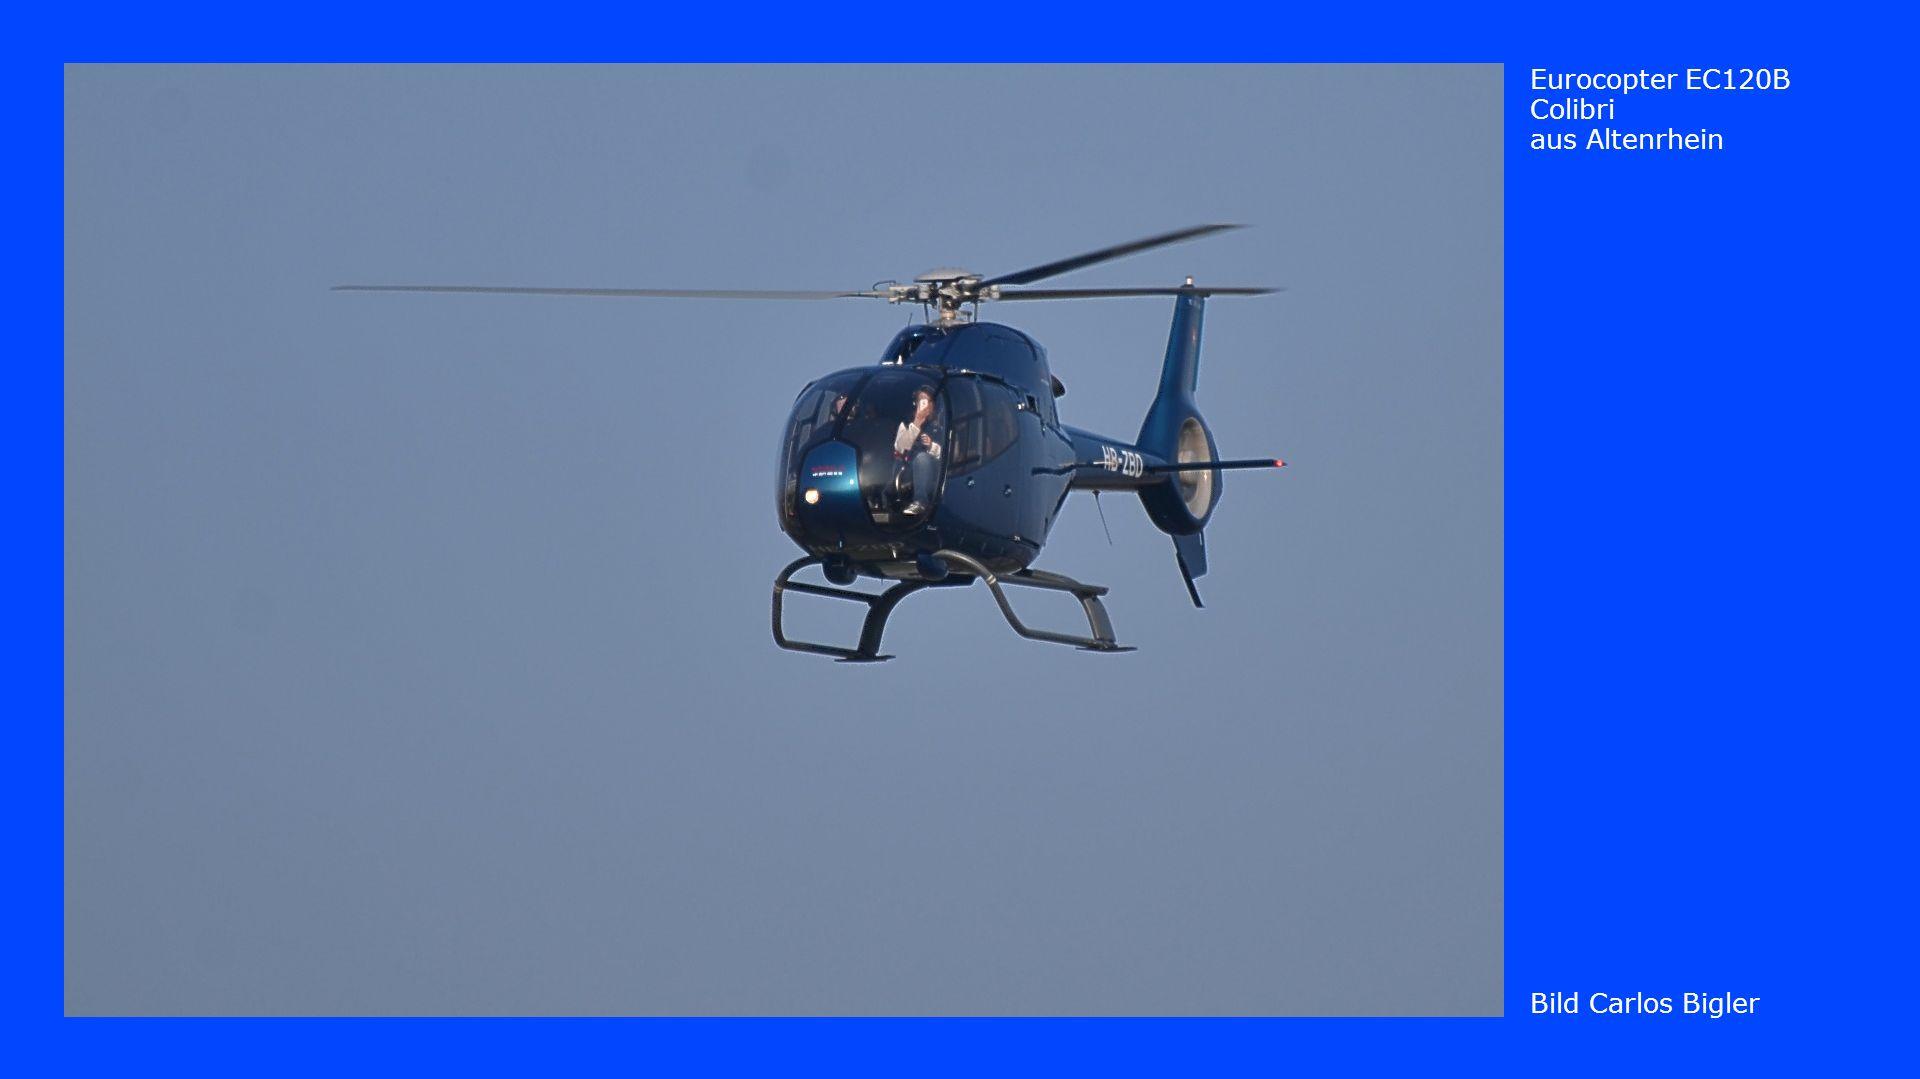 Bild Carlos Bigler Eurocopter EC120B Colibri aus Altenrhein